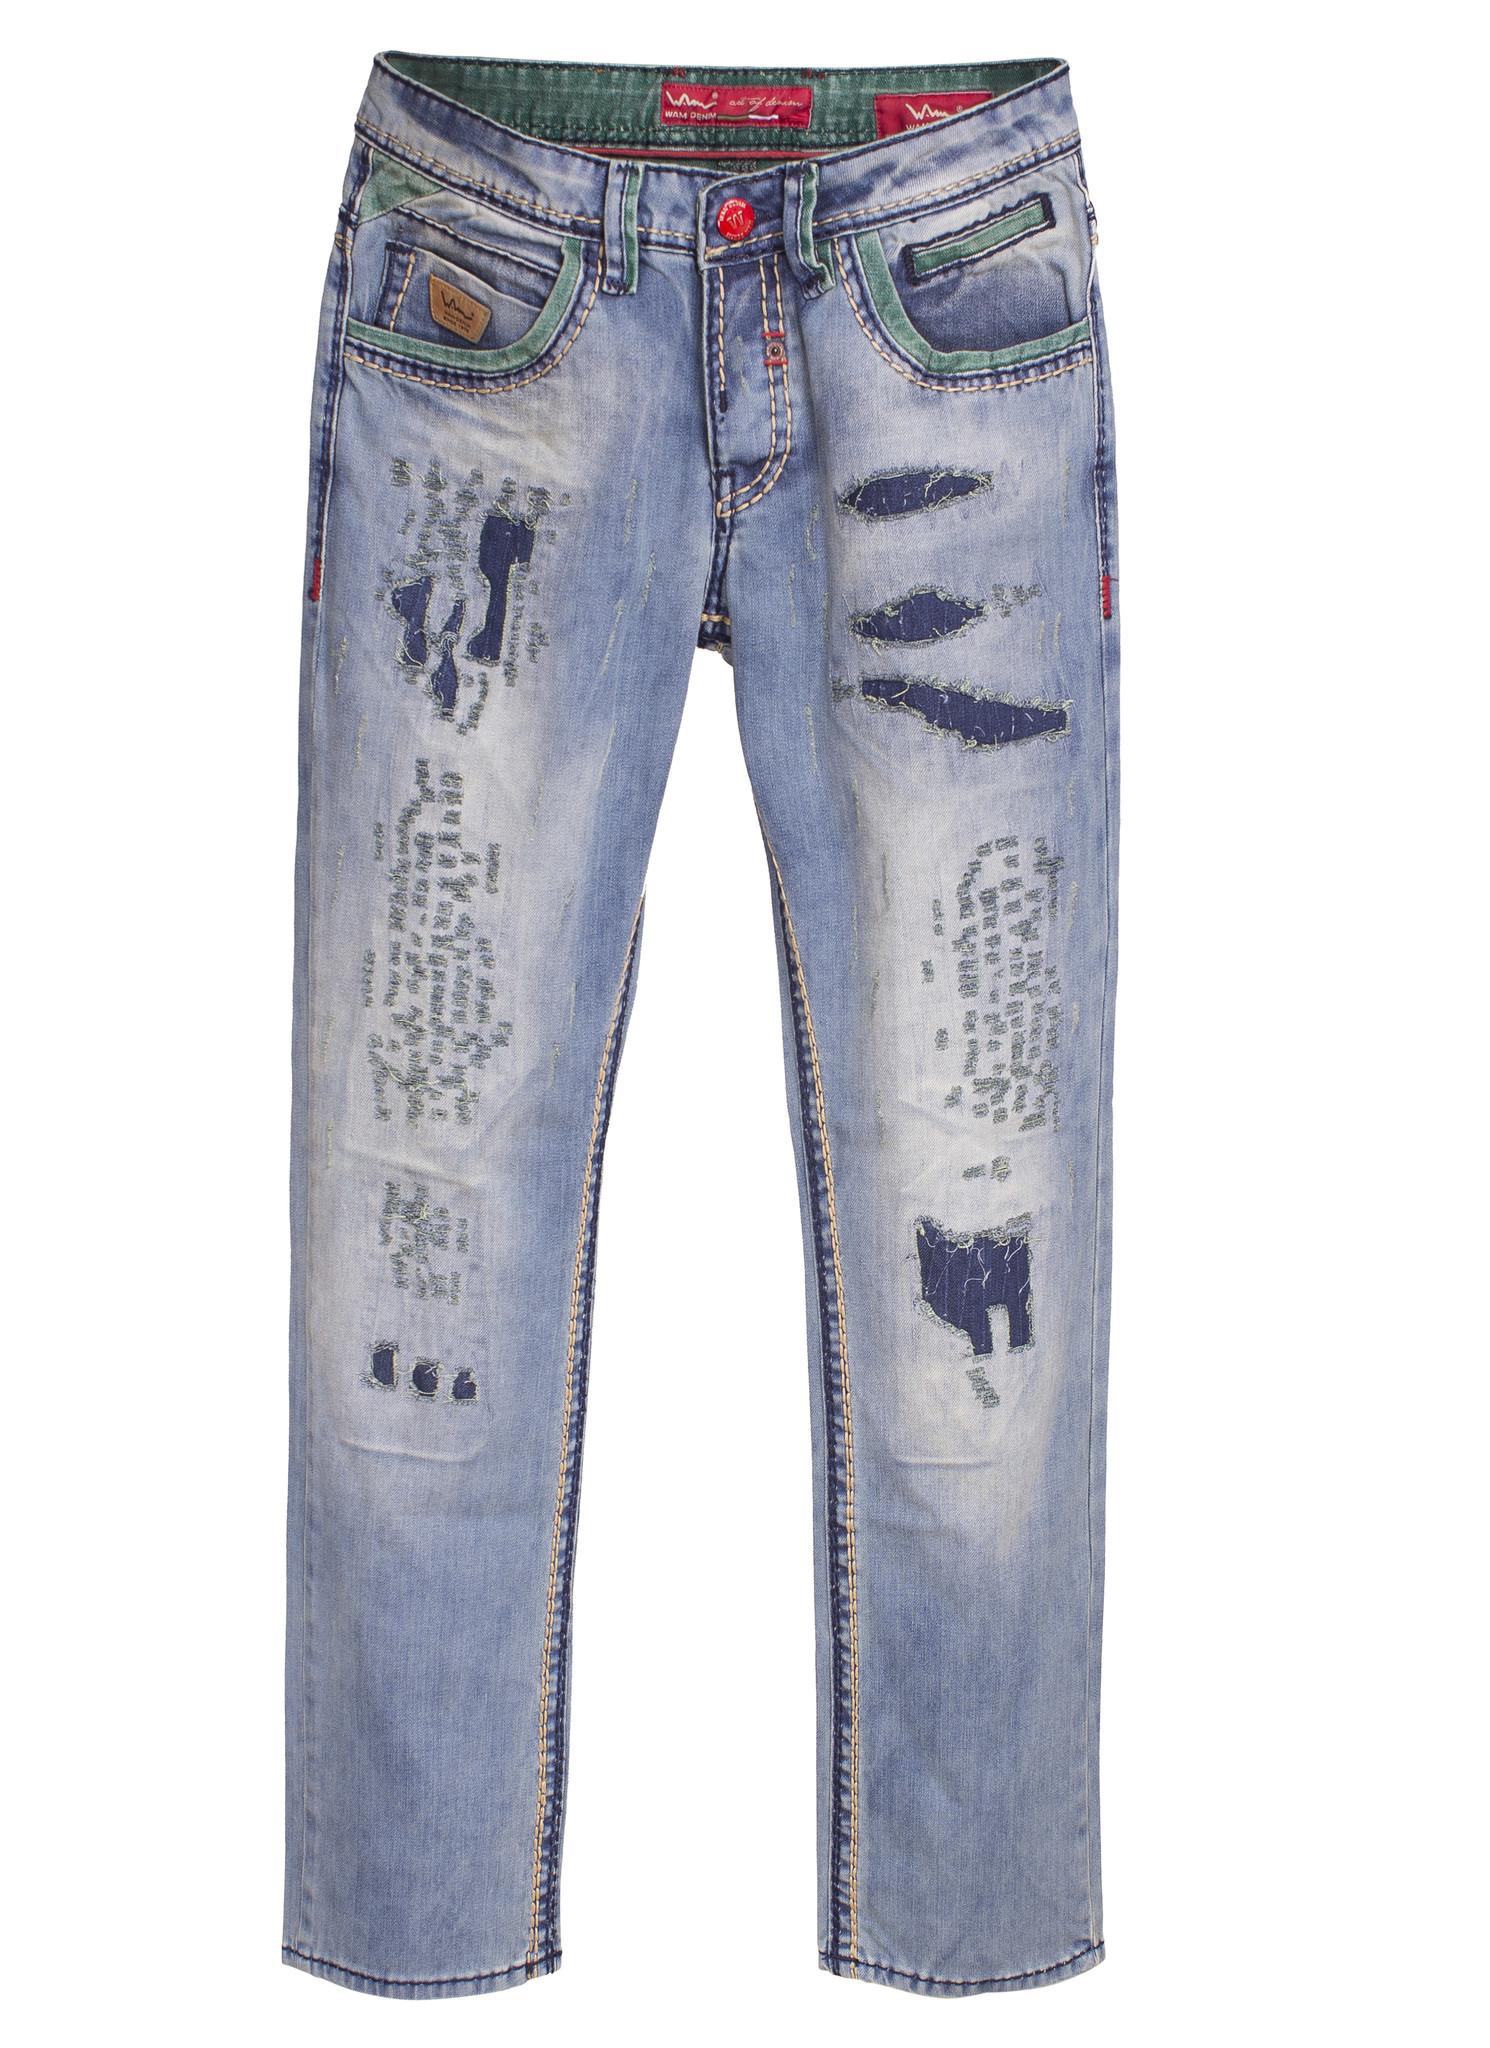 Wam Denim Jeans 92043 Blue